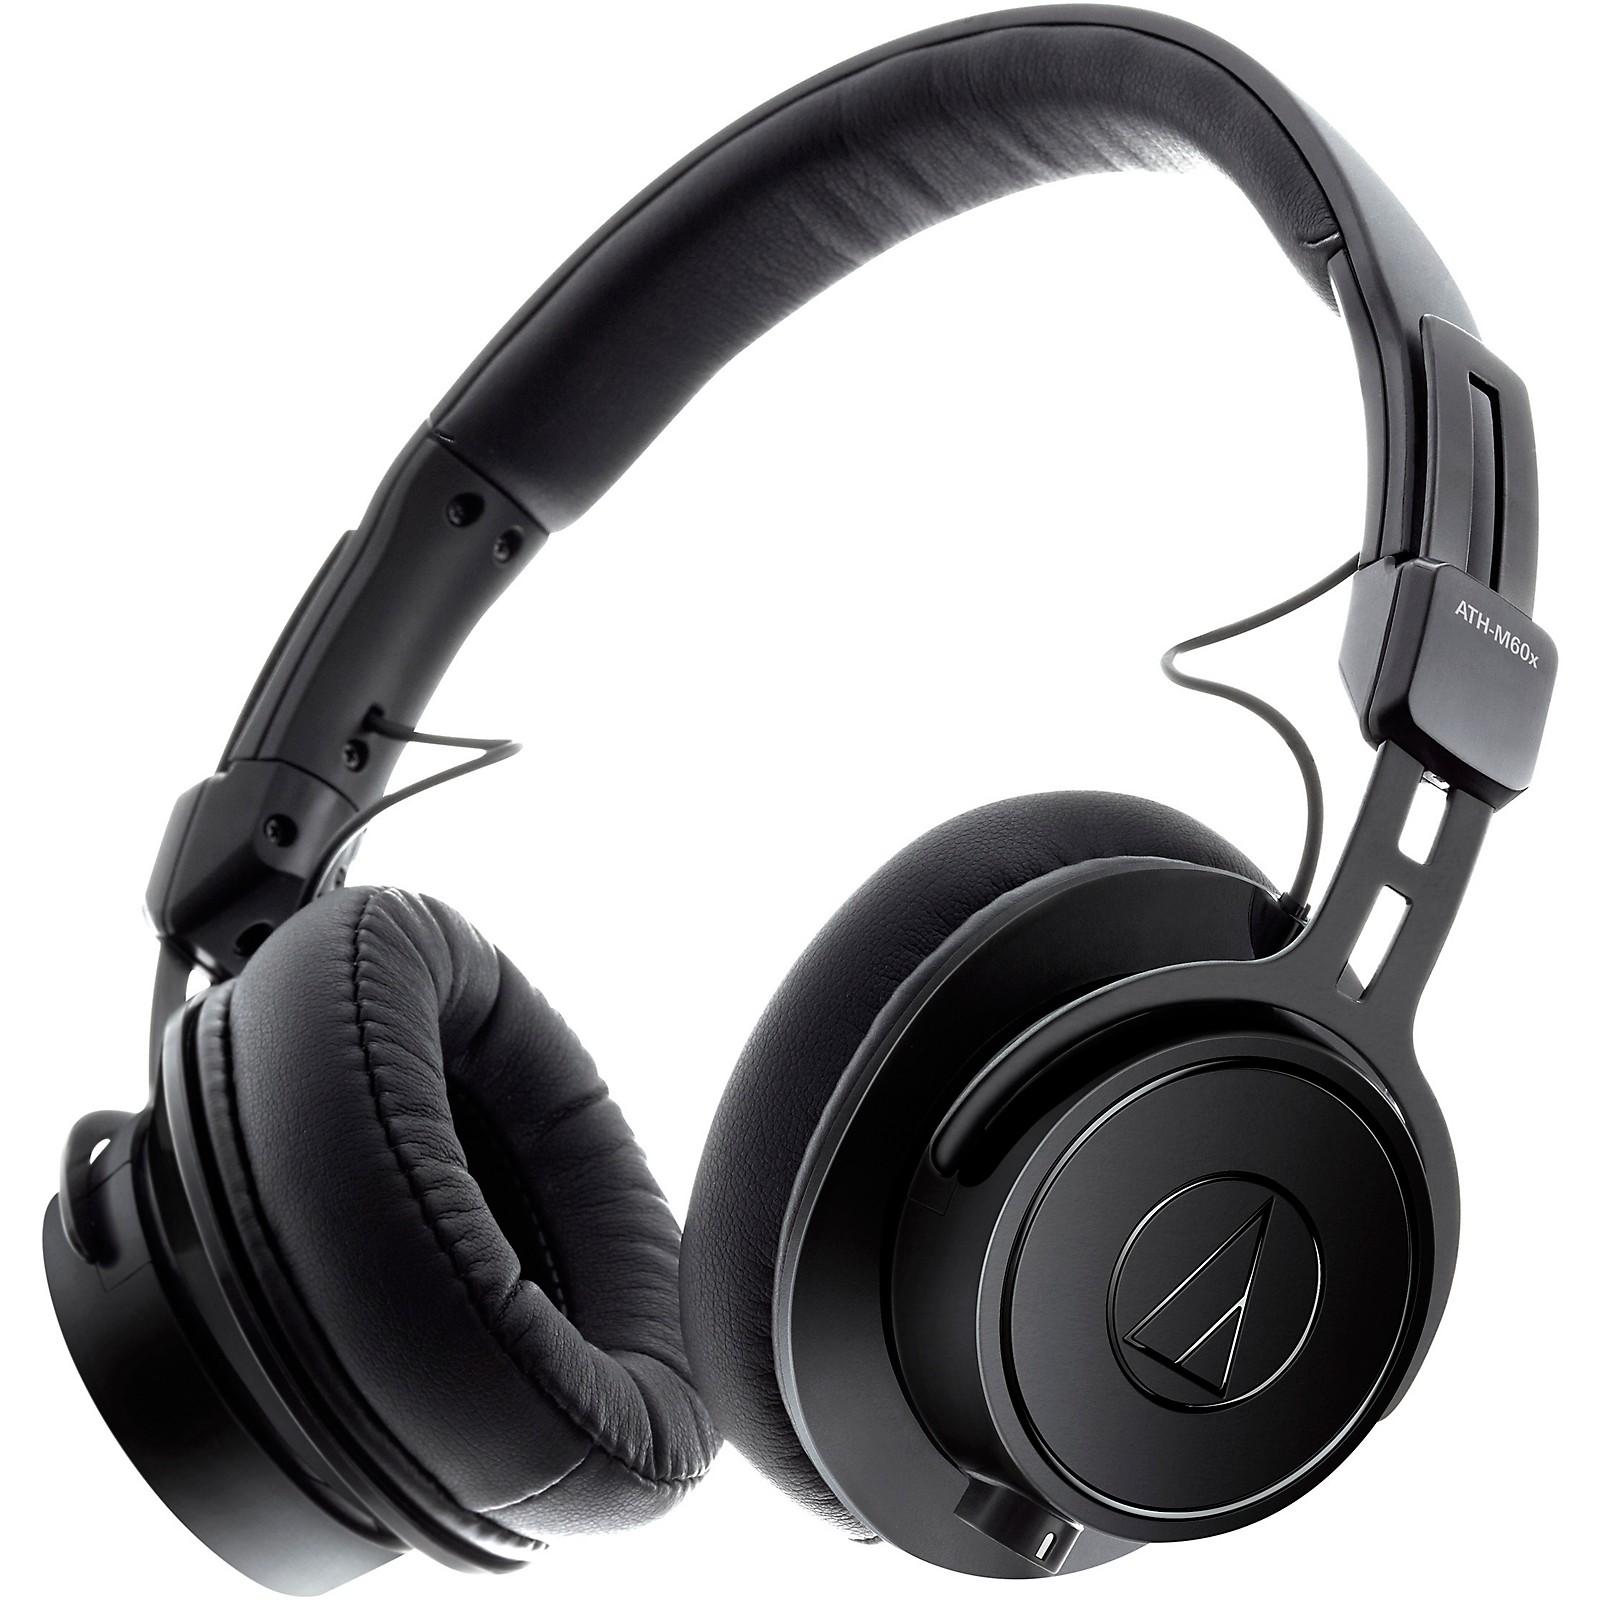 Audio-Technica ATH-M60x Professional Monitor Headphones